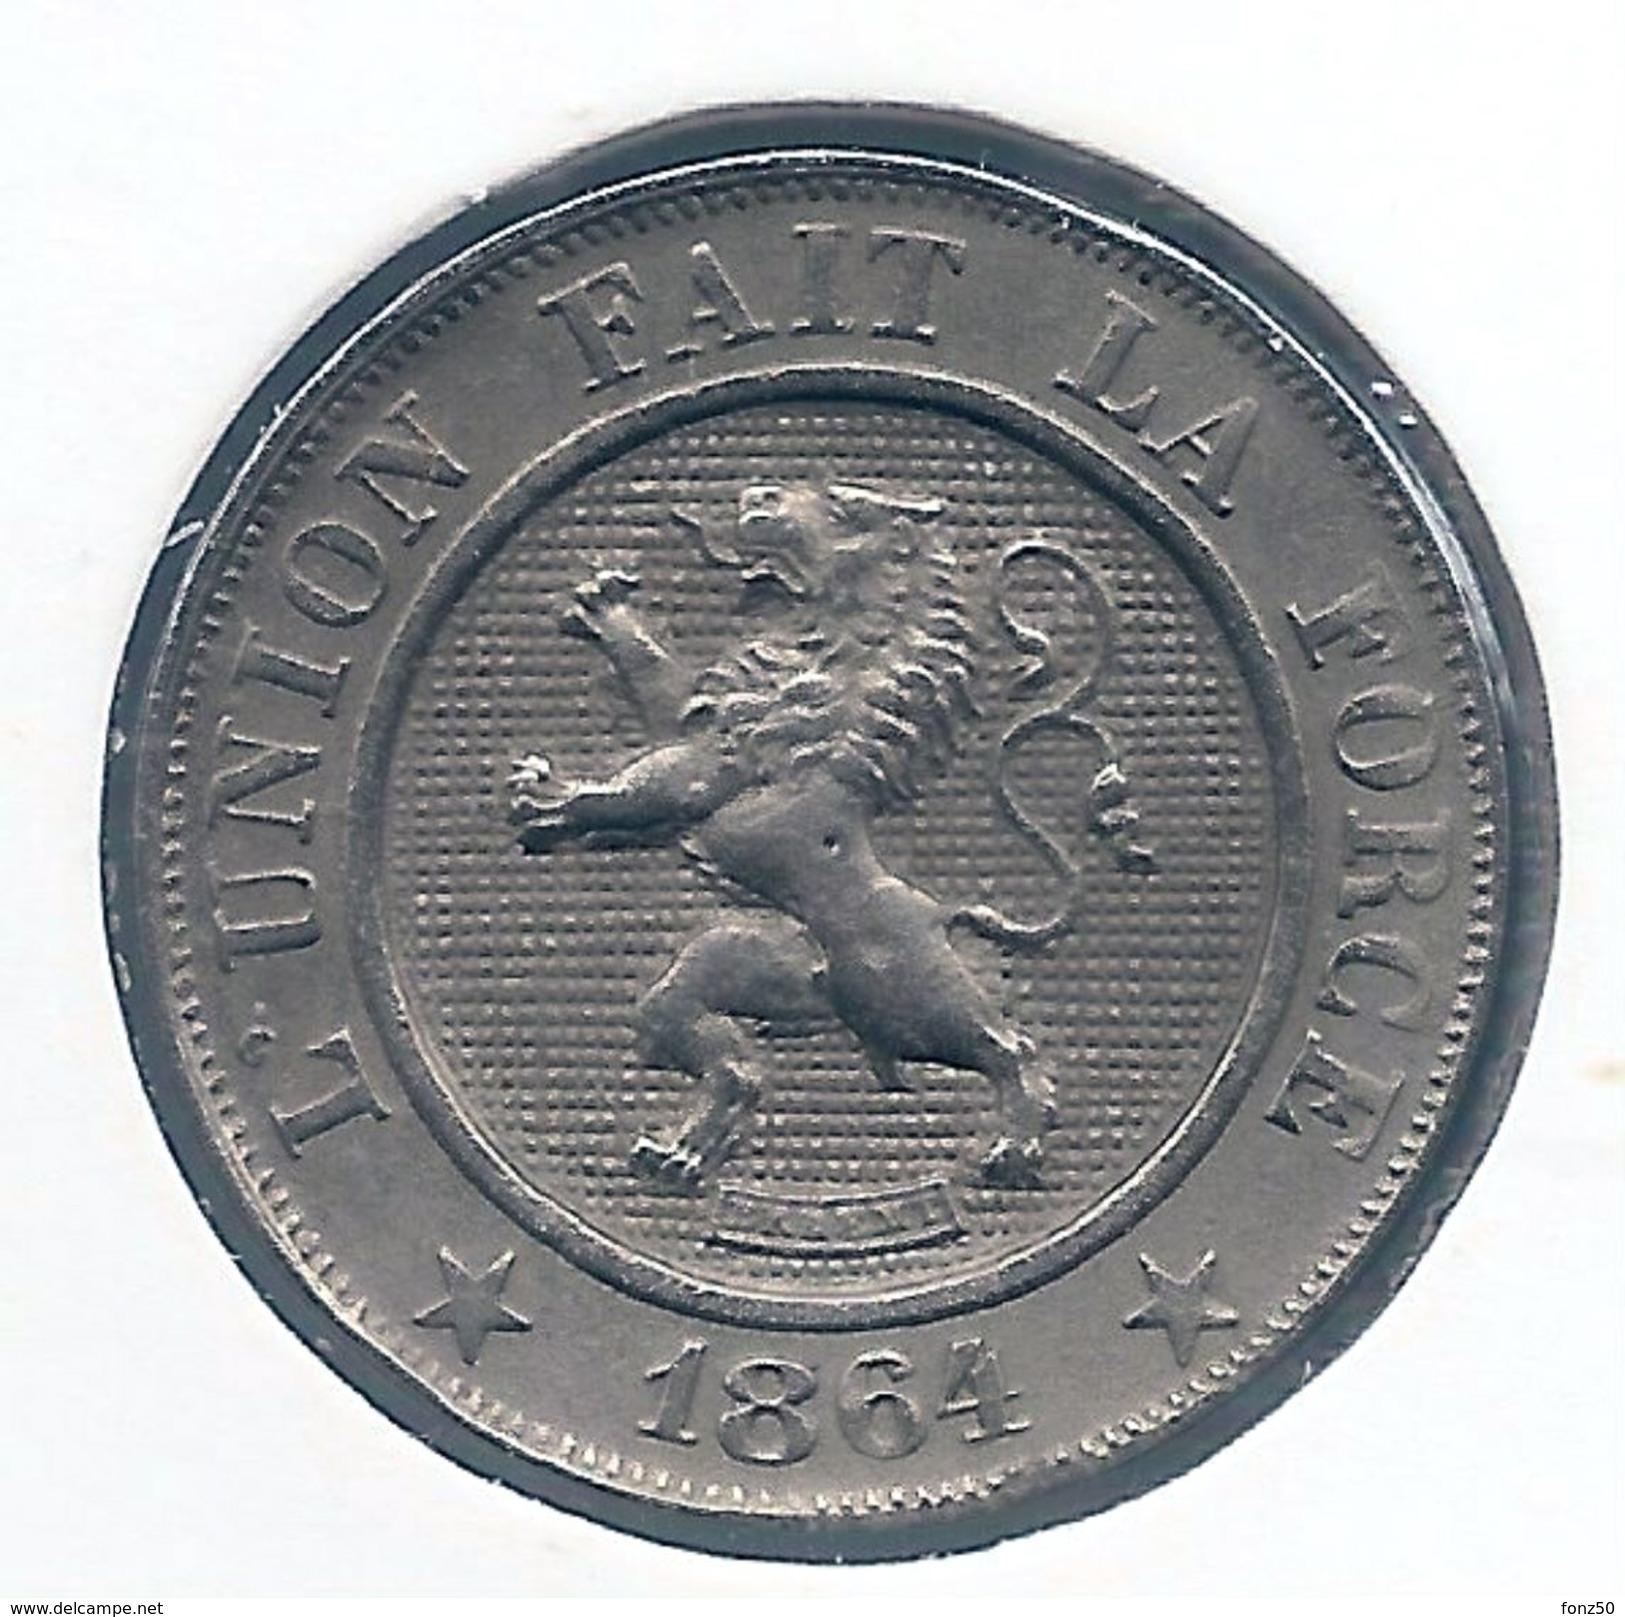 LEOPOLD I * 10 Centiem 1864 * Prachtig * Nr 8277 - 1831-1865: Léopold I